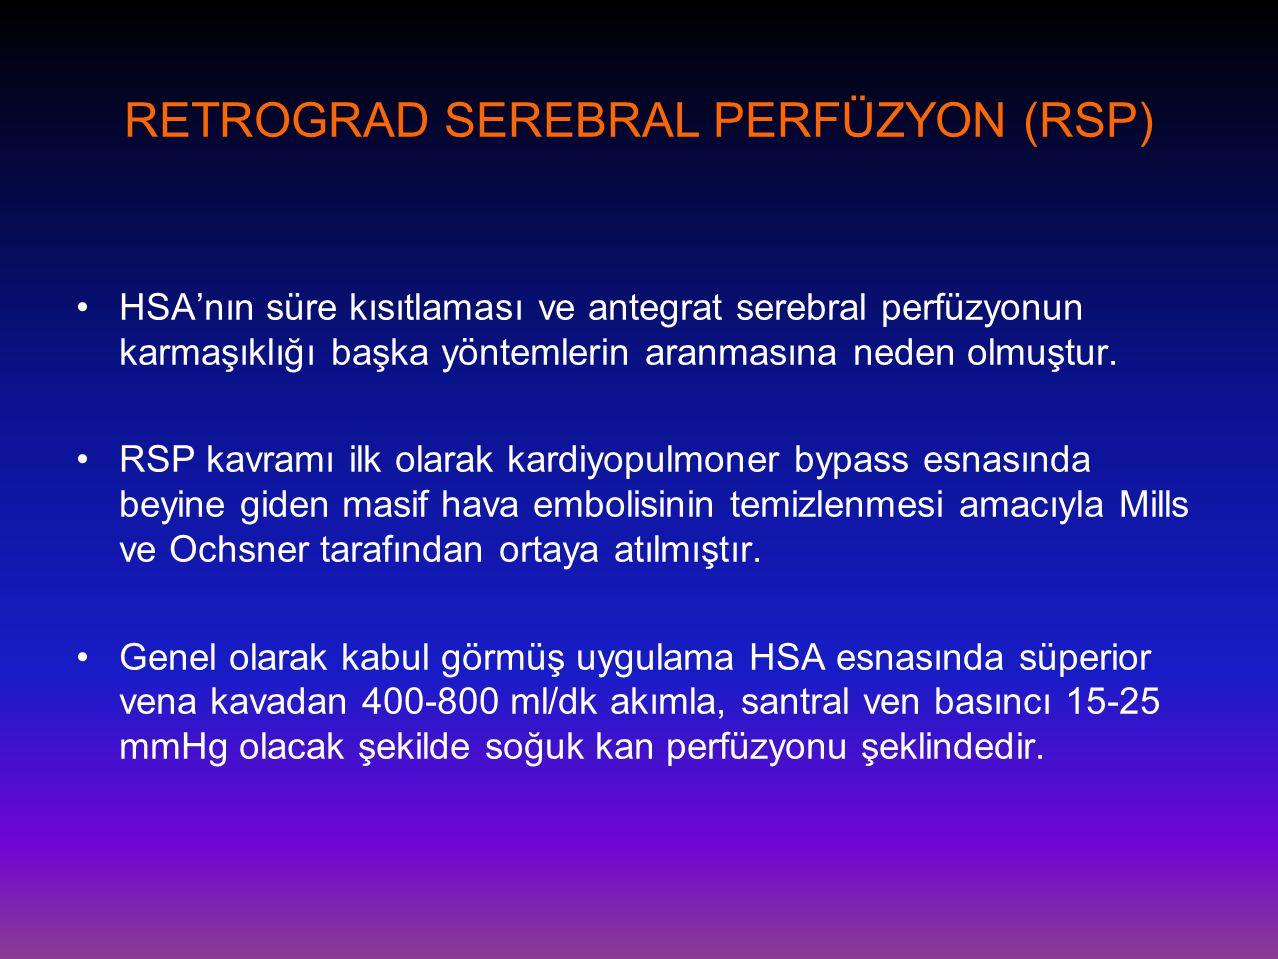 RETROGRAD SEREBRAL PERFÜZYON (RSP)